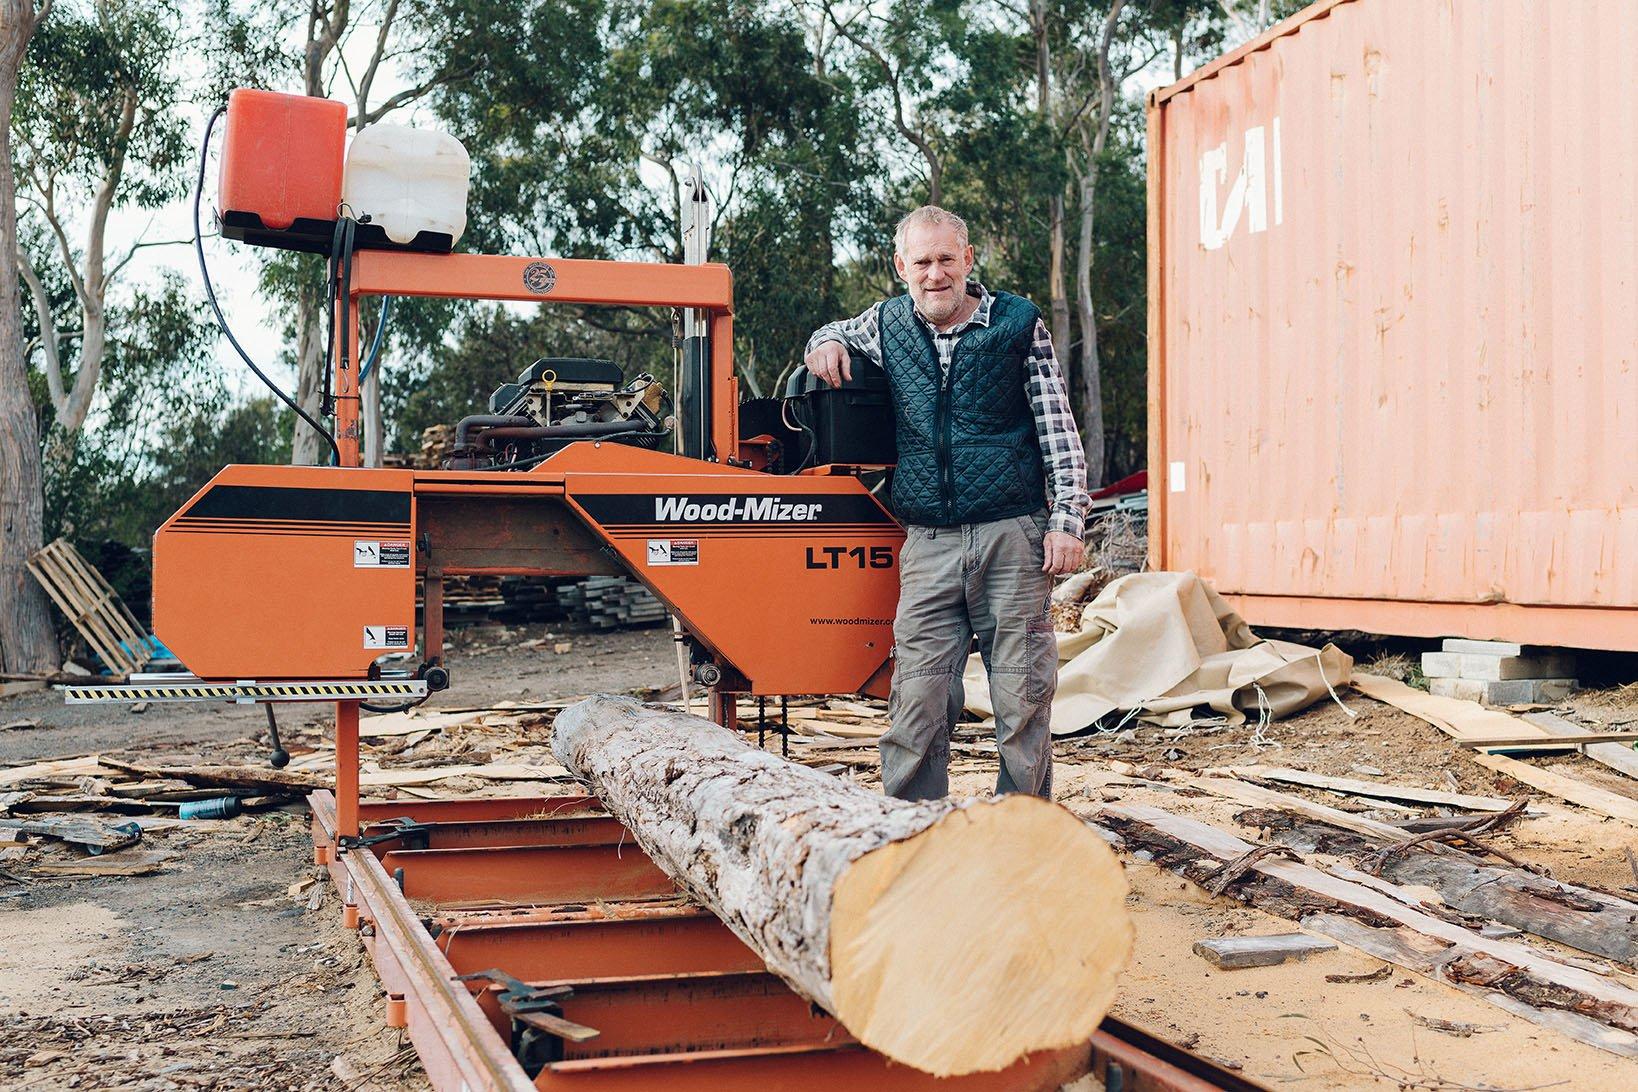 Portable Sawmills and Wood Processing Equipment | Wood-Mizer Australia